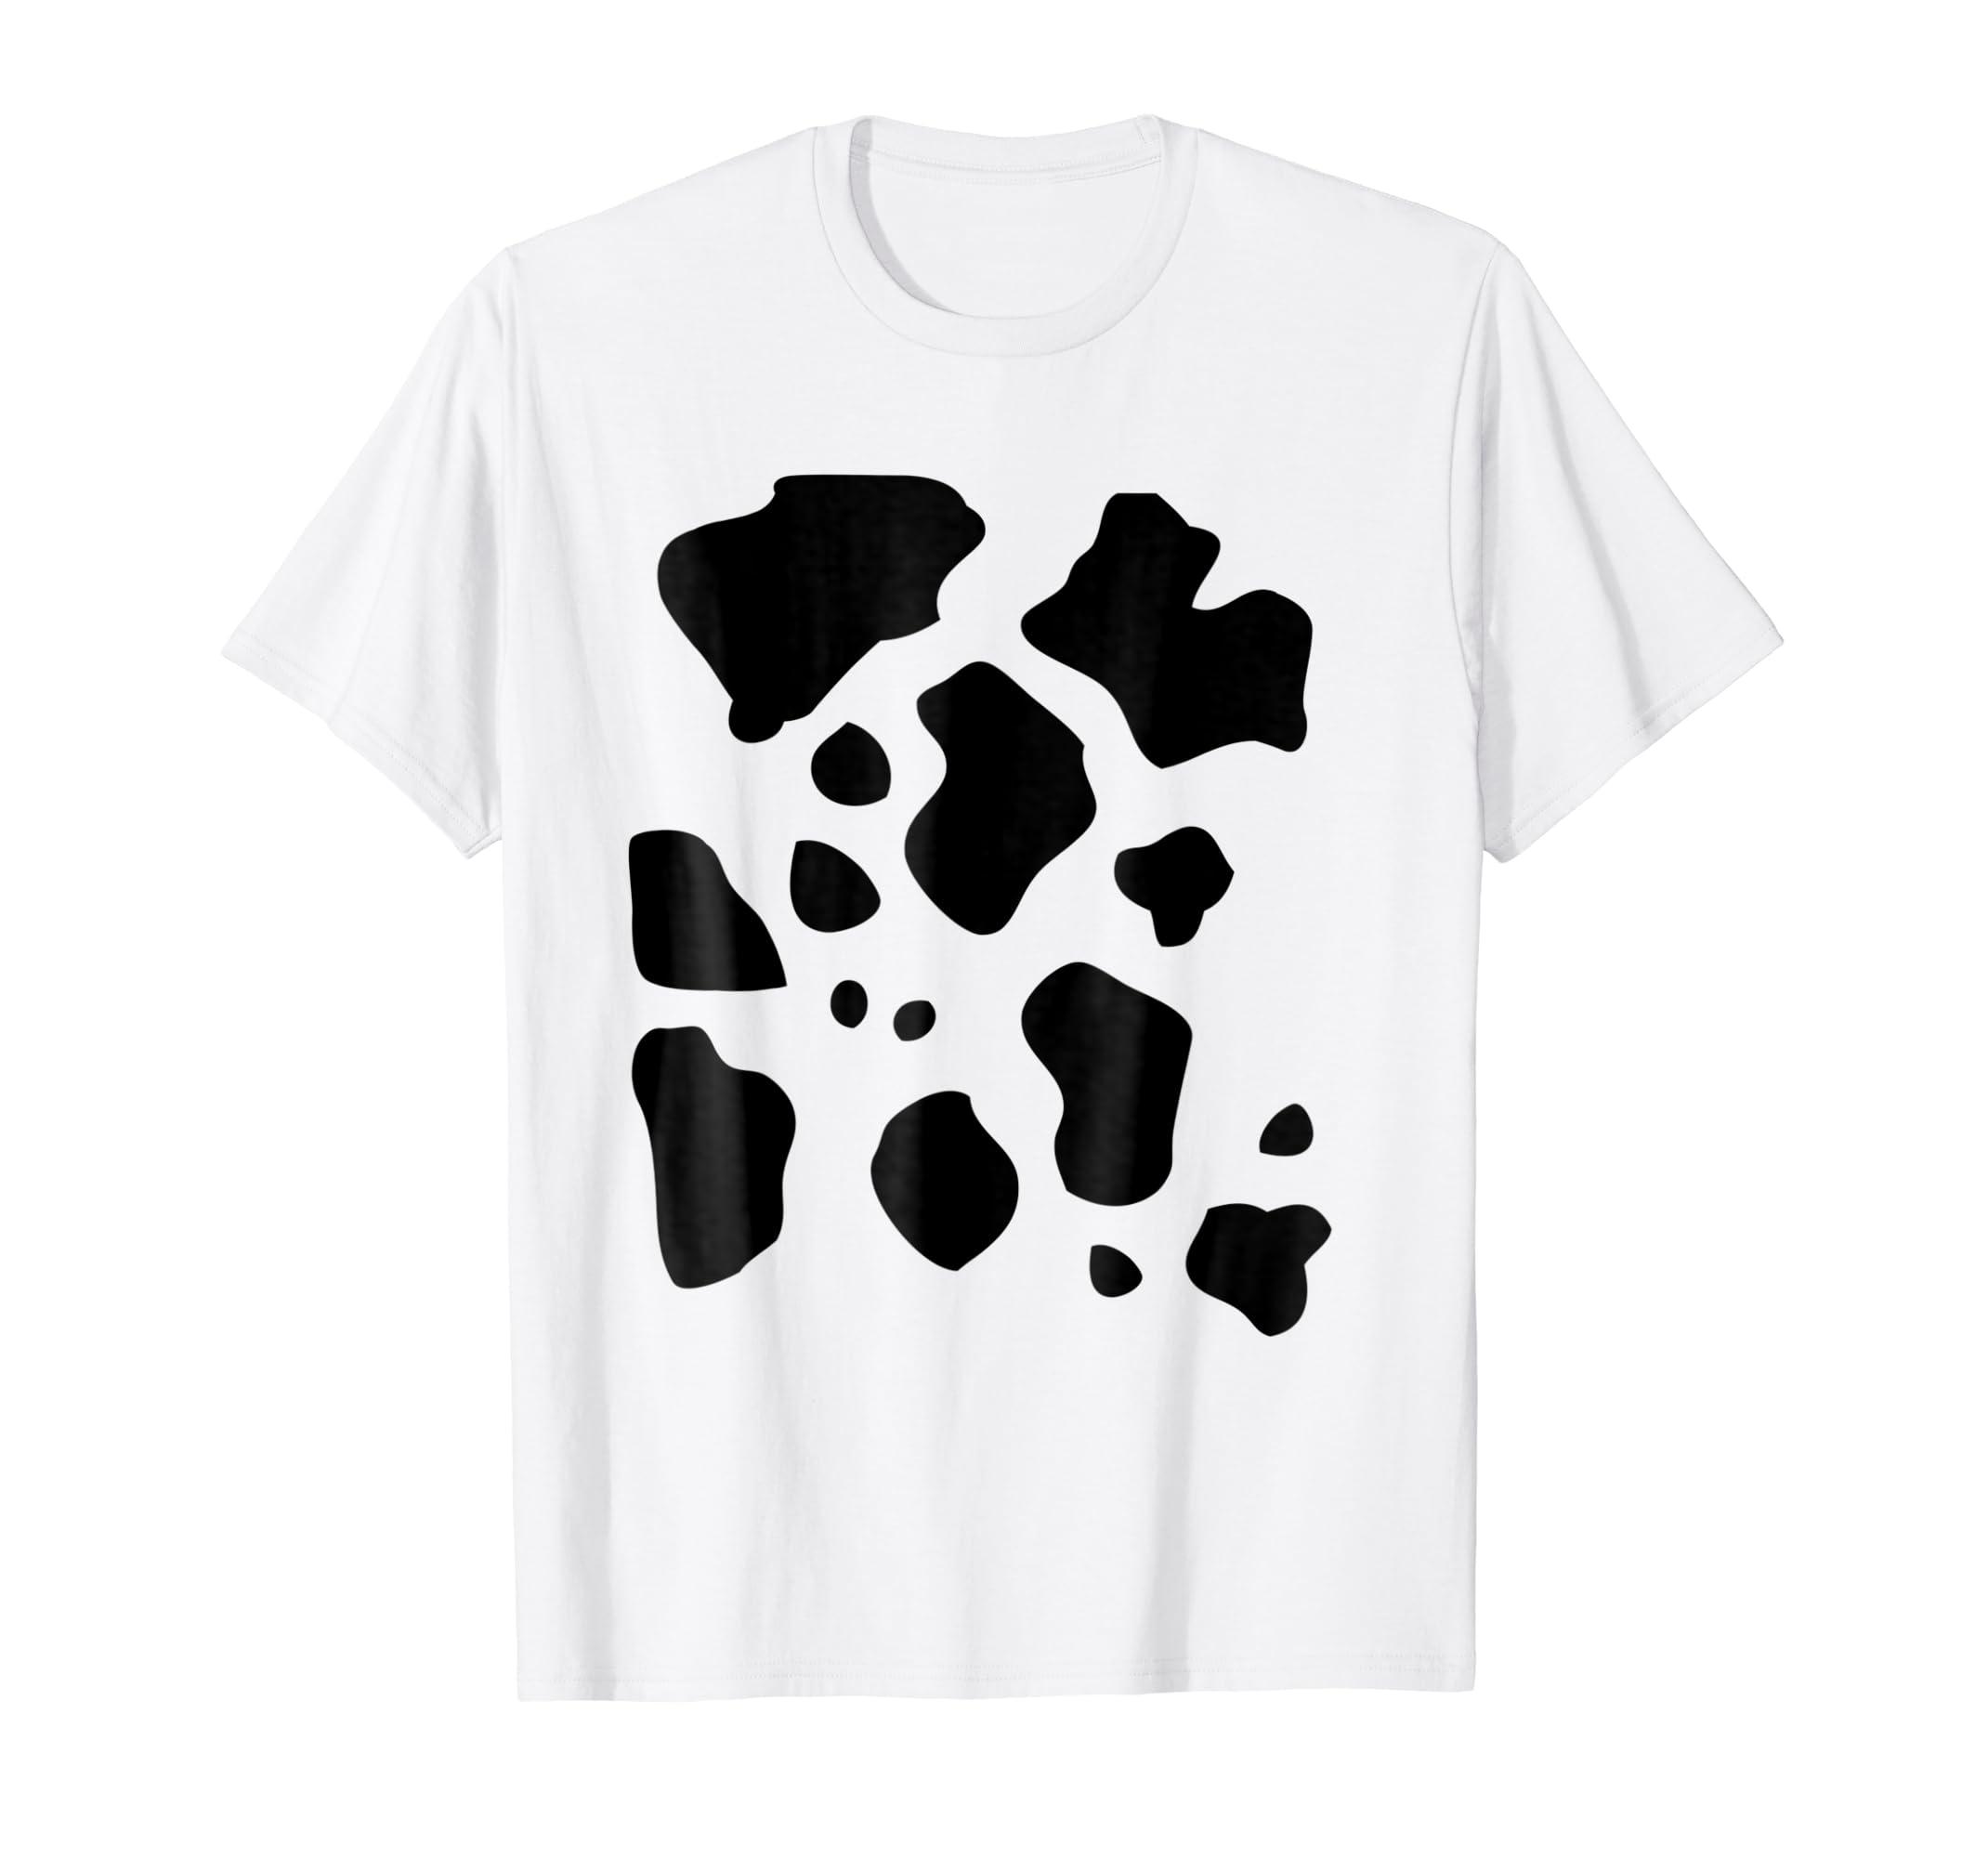 Amazon Funny Halloween Costume Shirt Cow Pattern Print Gift